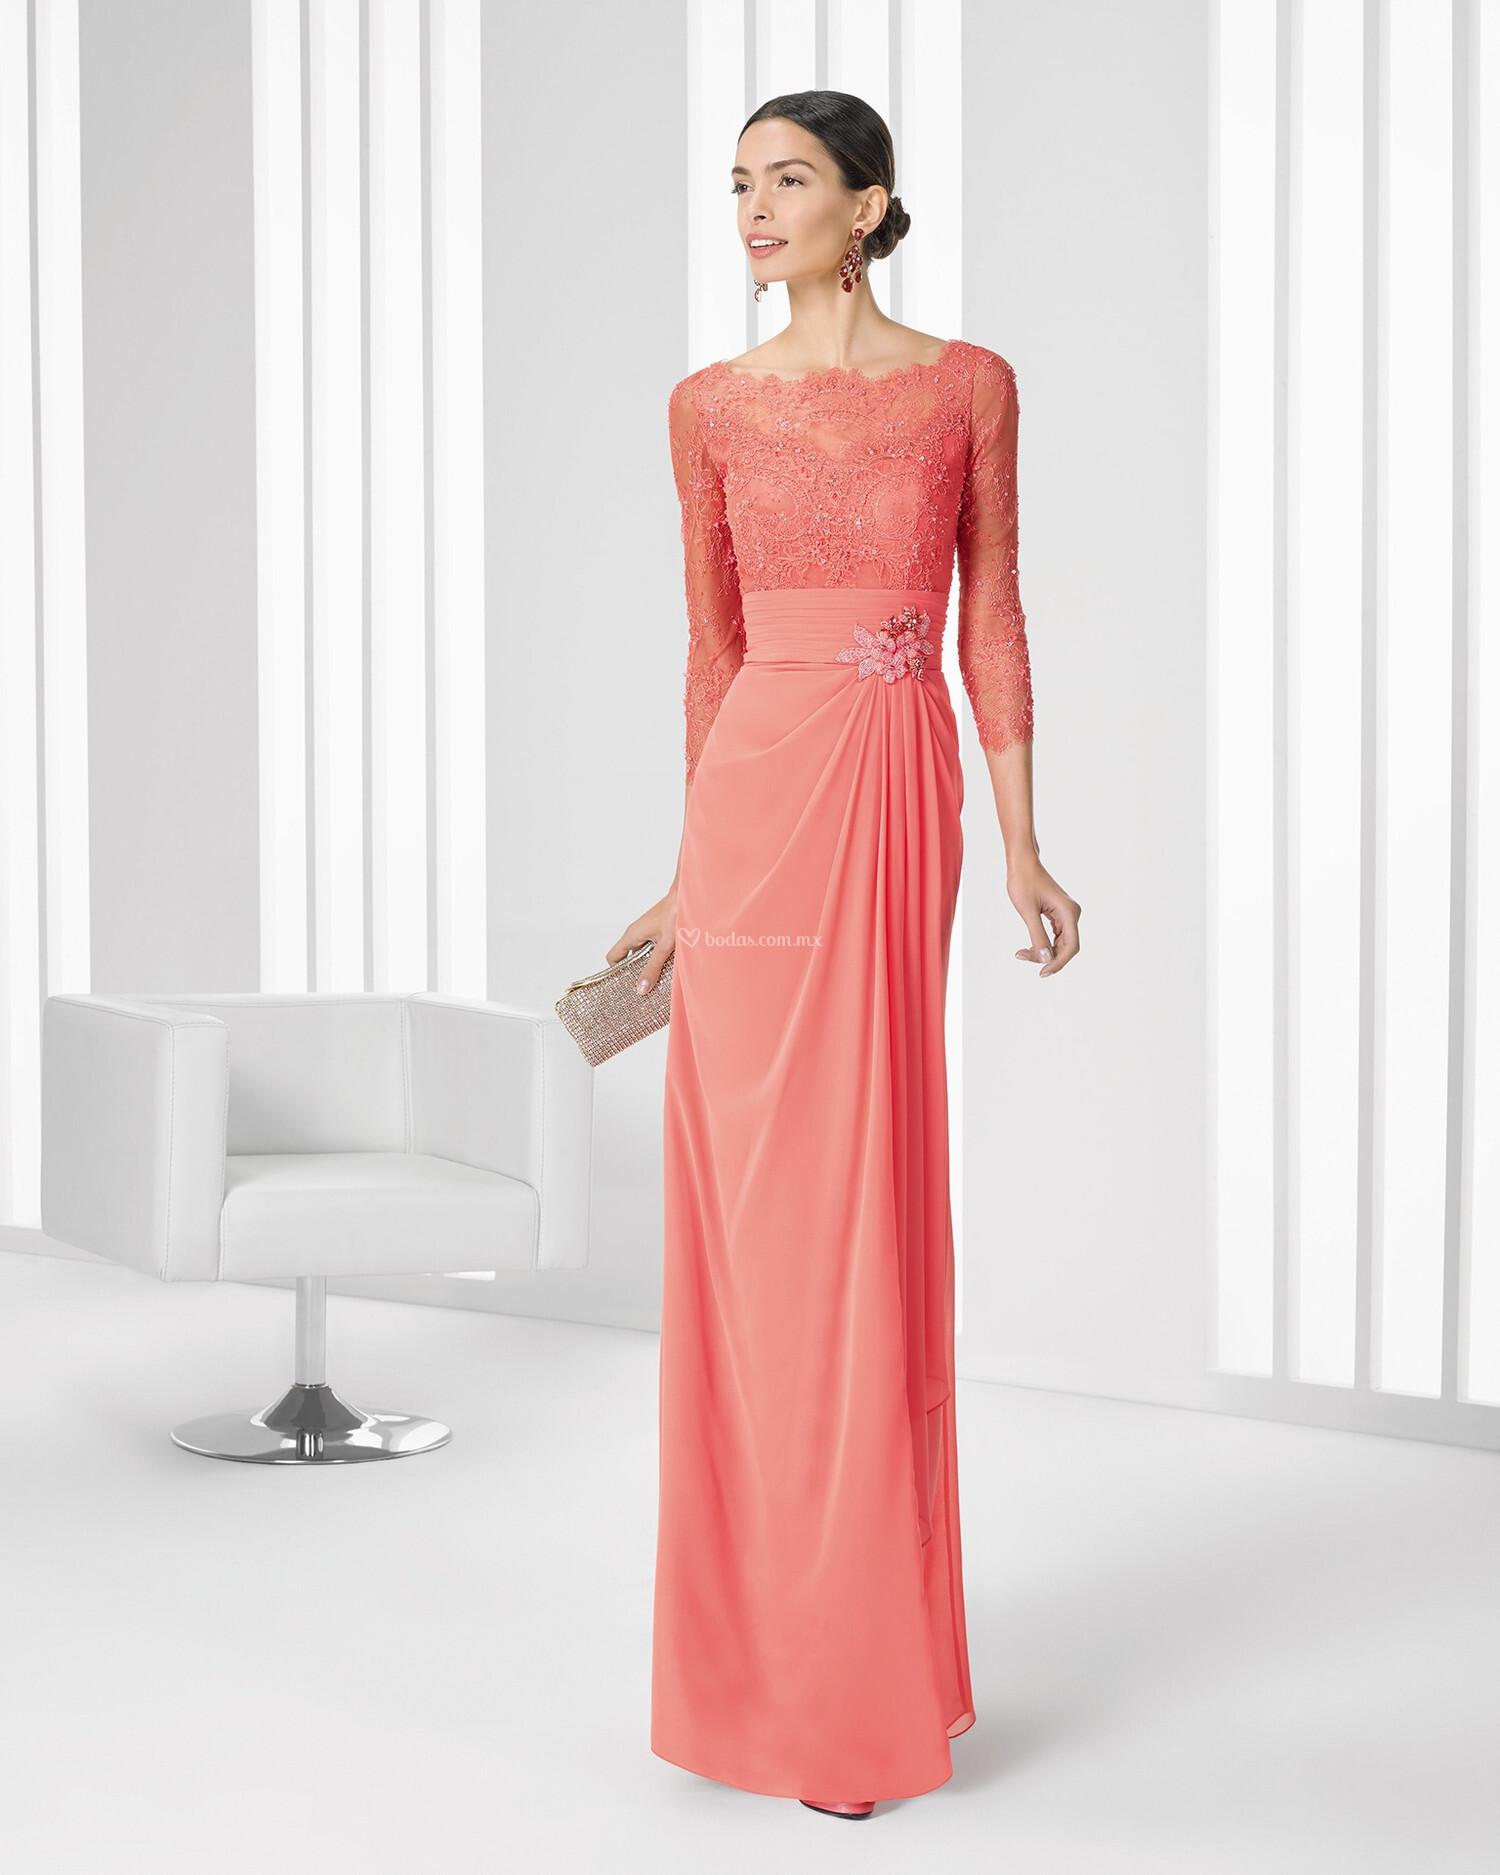 Perfecto Vestido De Novia Conservadora Motivo - Colección de ...